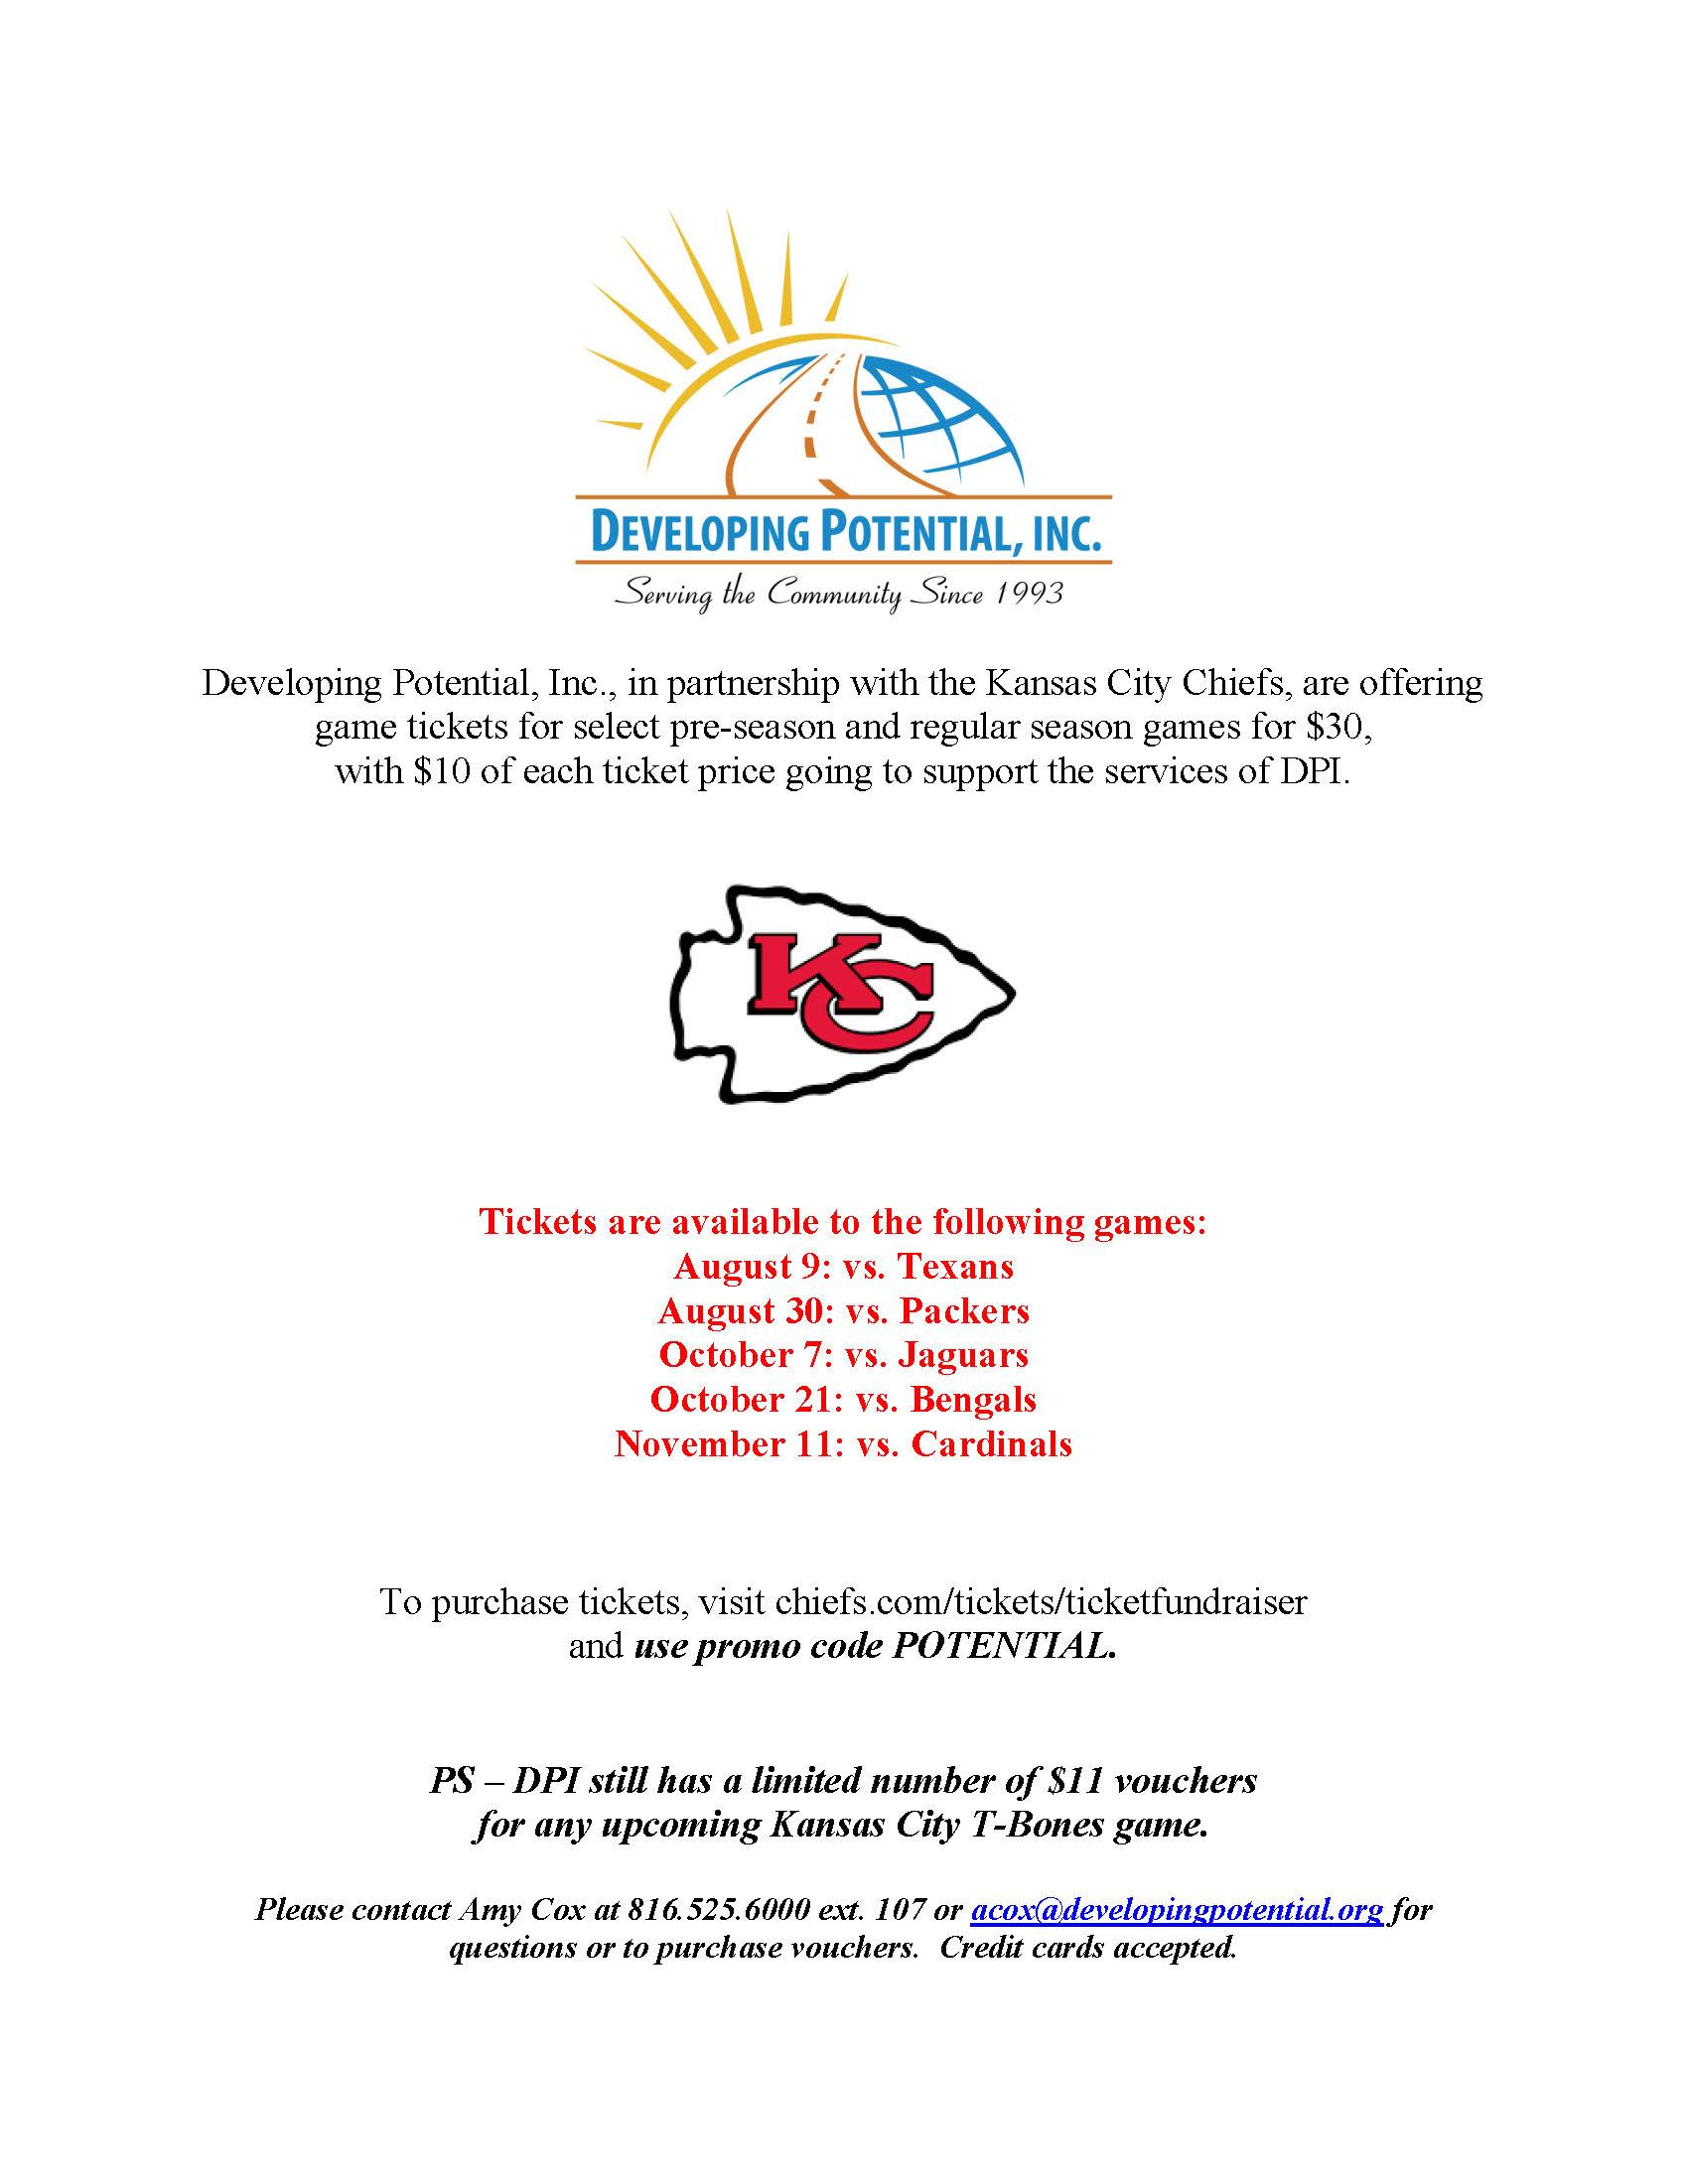 DPI KC Chiefs fundraiser flyer 2018.jpg